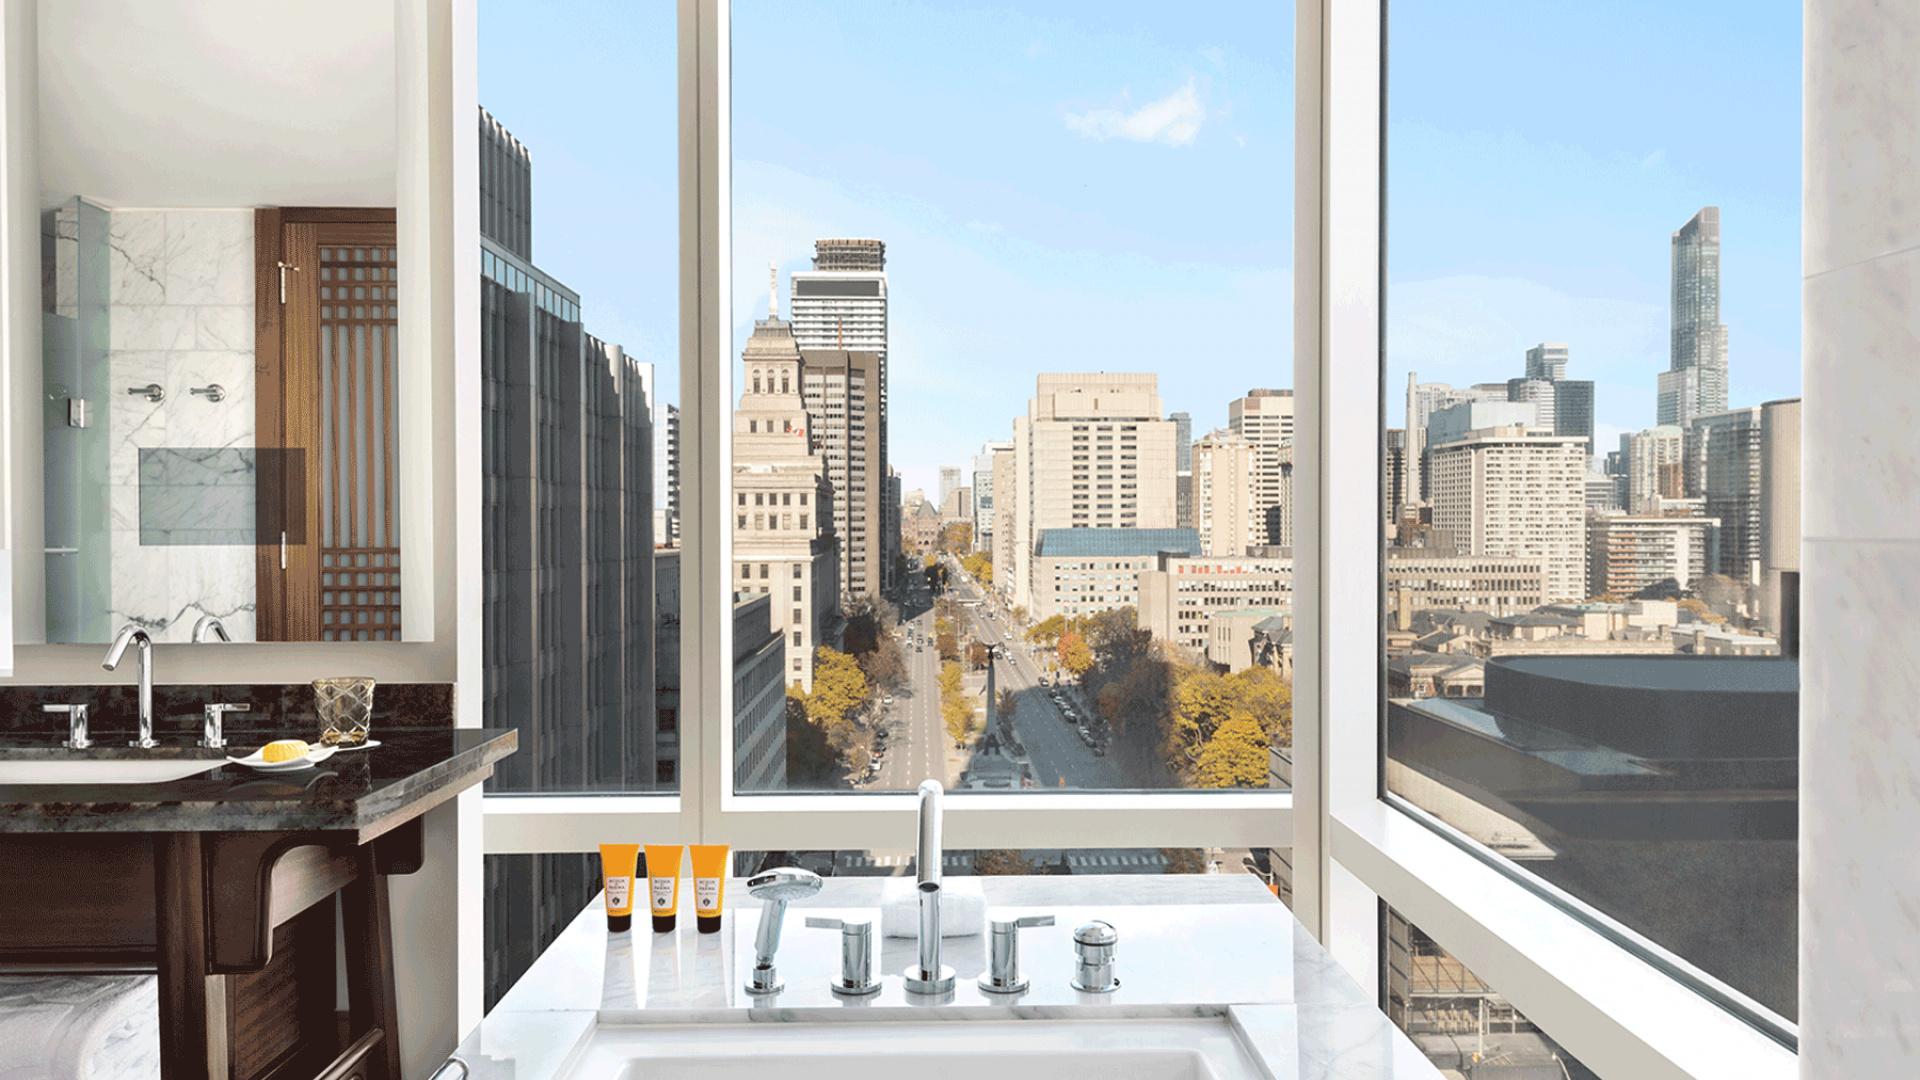 Shangri-La Hotel Toronto | Bathtub overlooking the city